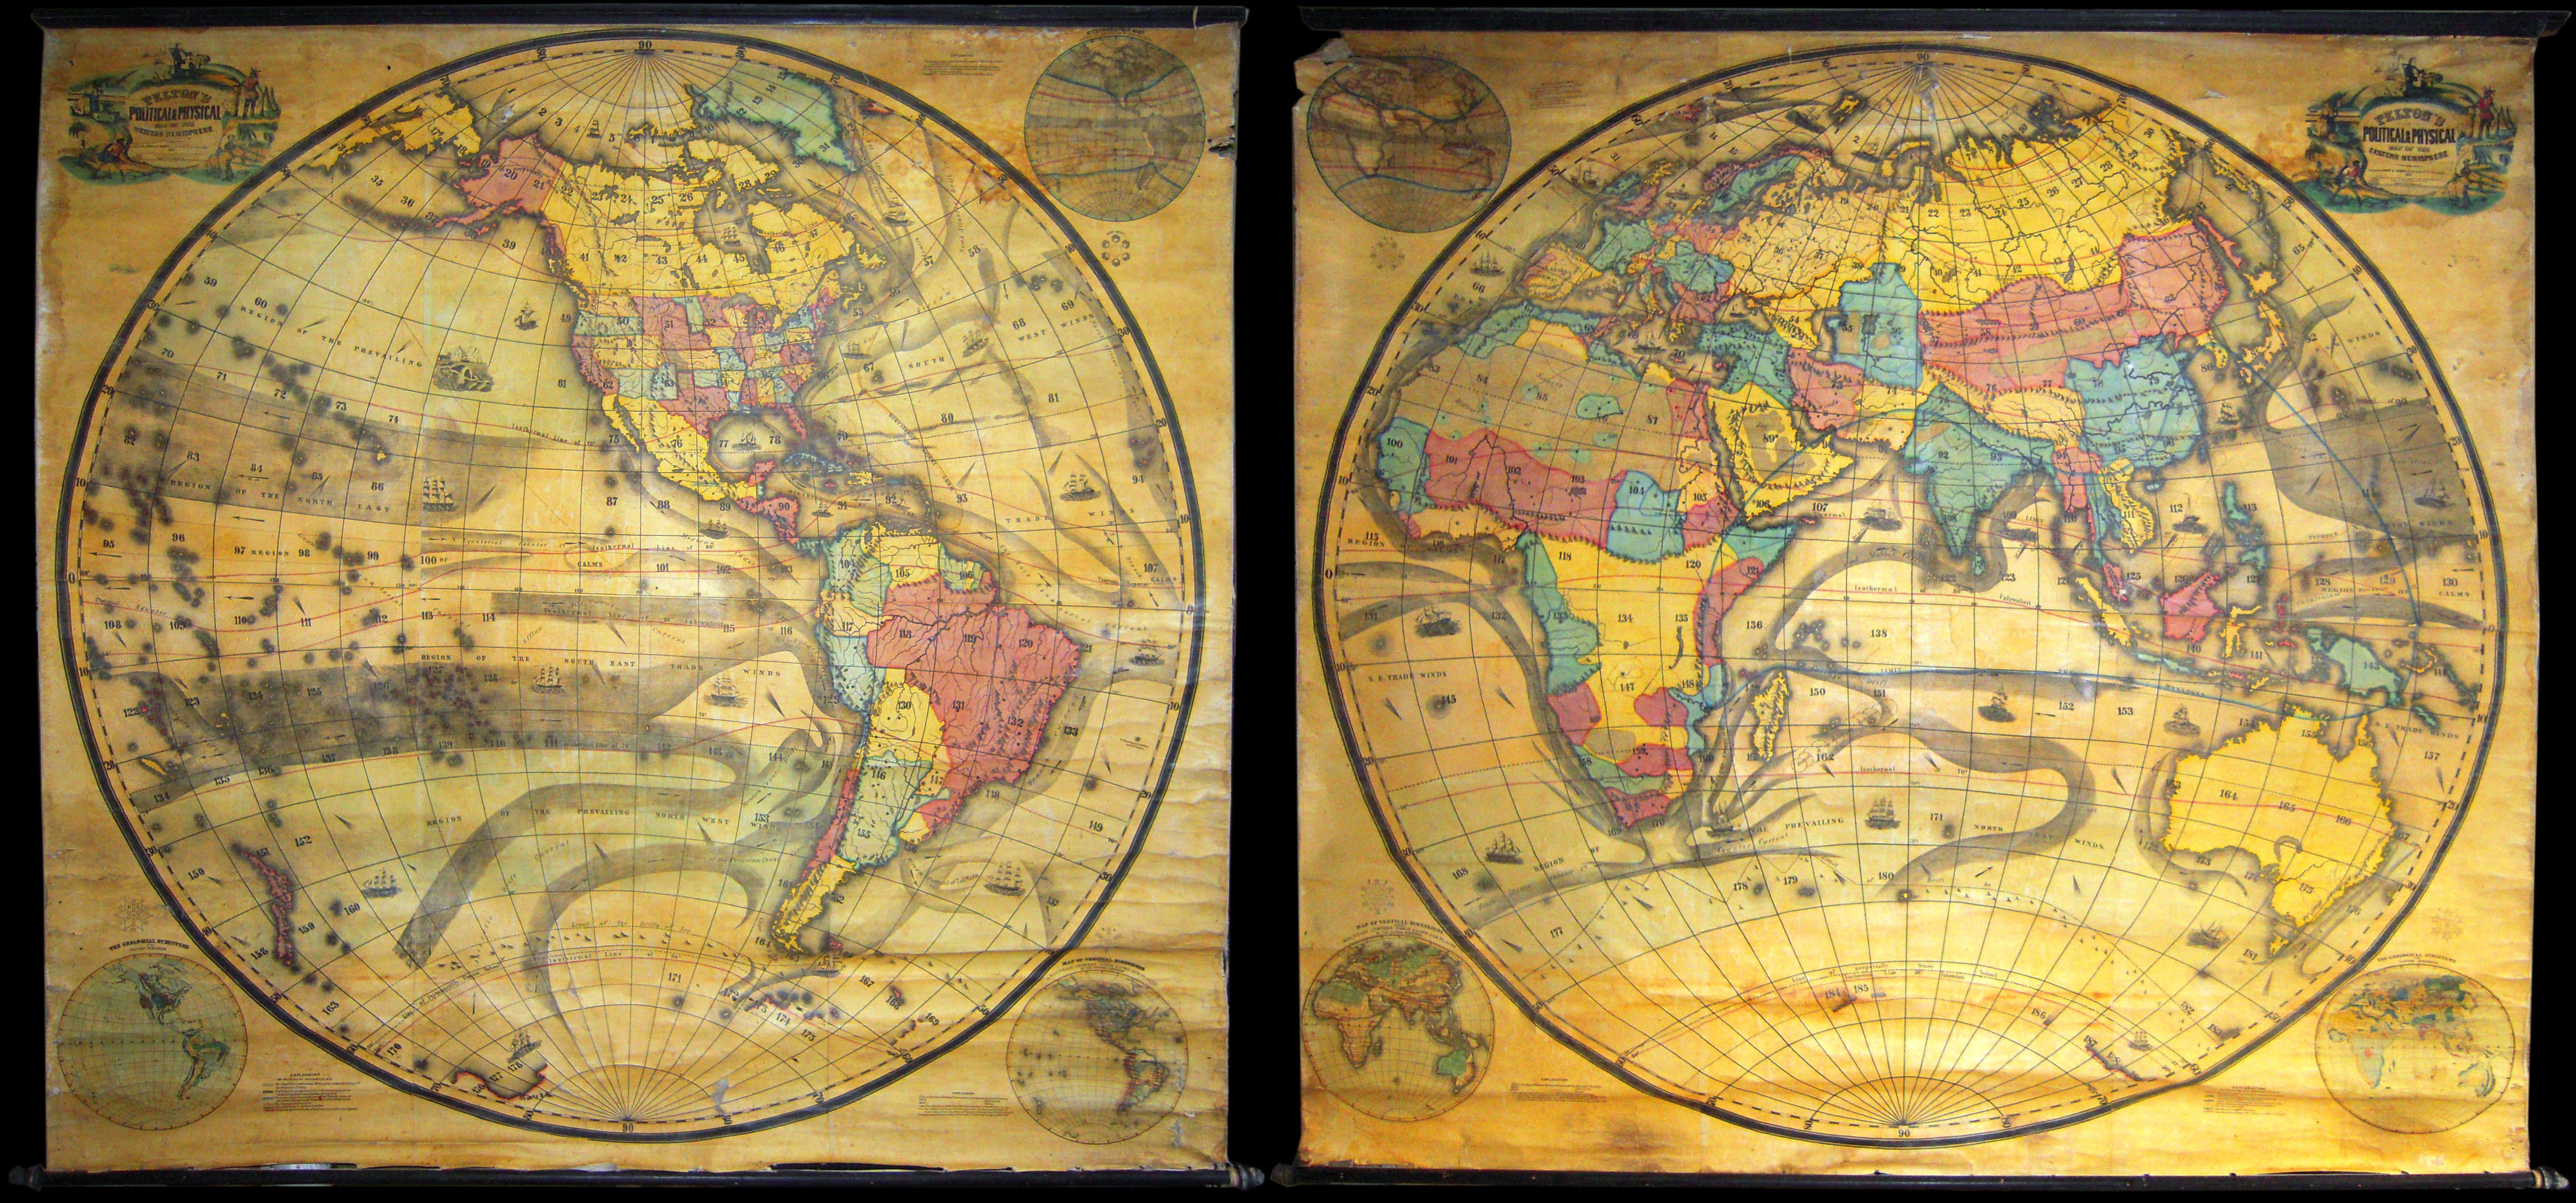 File:1858 Set Of Two Pelton Wall Maps, Western Hemisphere And Eastern  Hemisphere